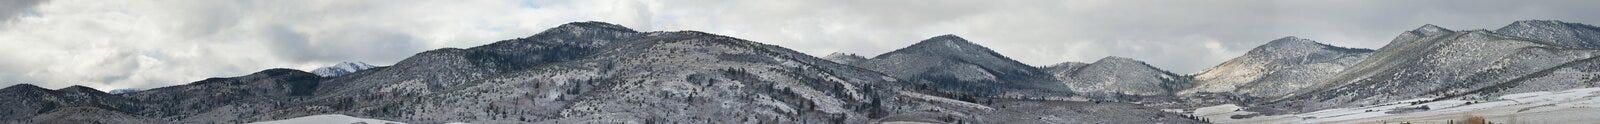 Vale do inverno foto de stock